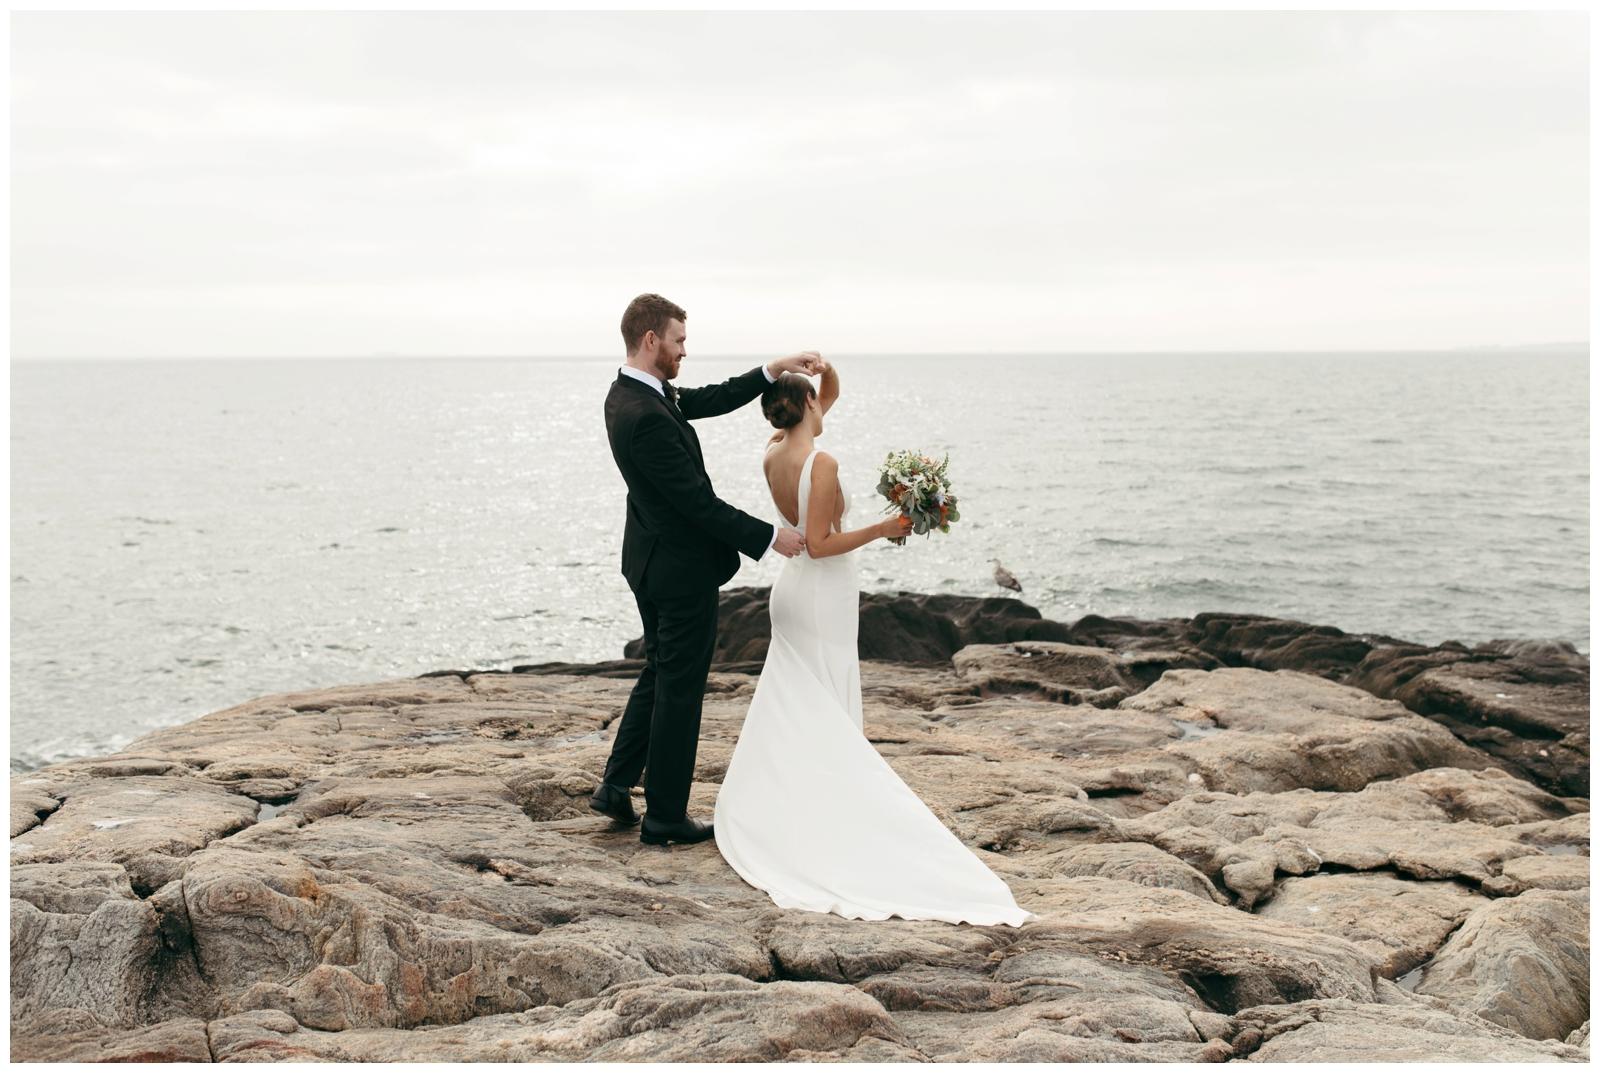 Madison-Beach-Hotel-Wedding-Bailey-Q-Photo-Boston-Wedding-Photographer-011.jpg